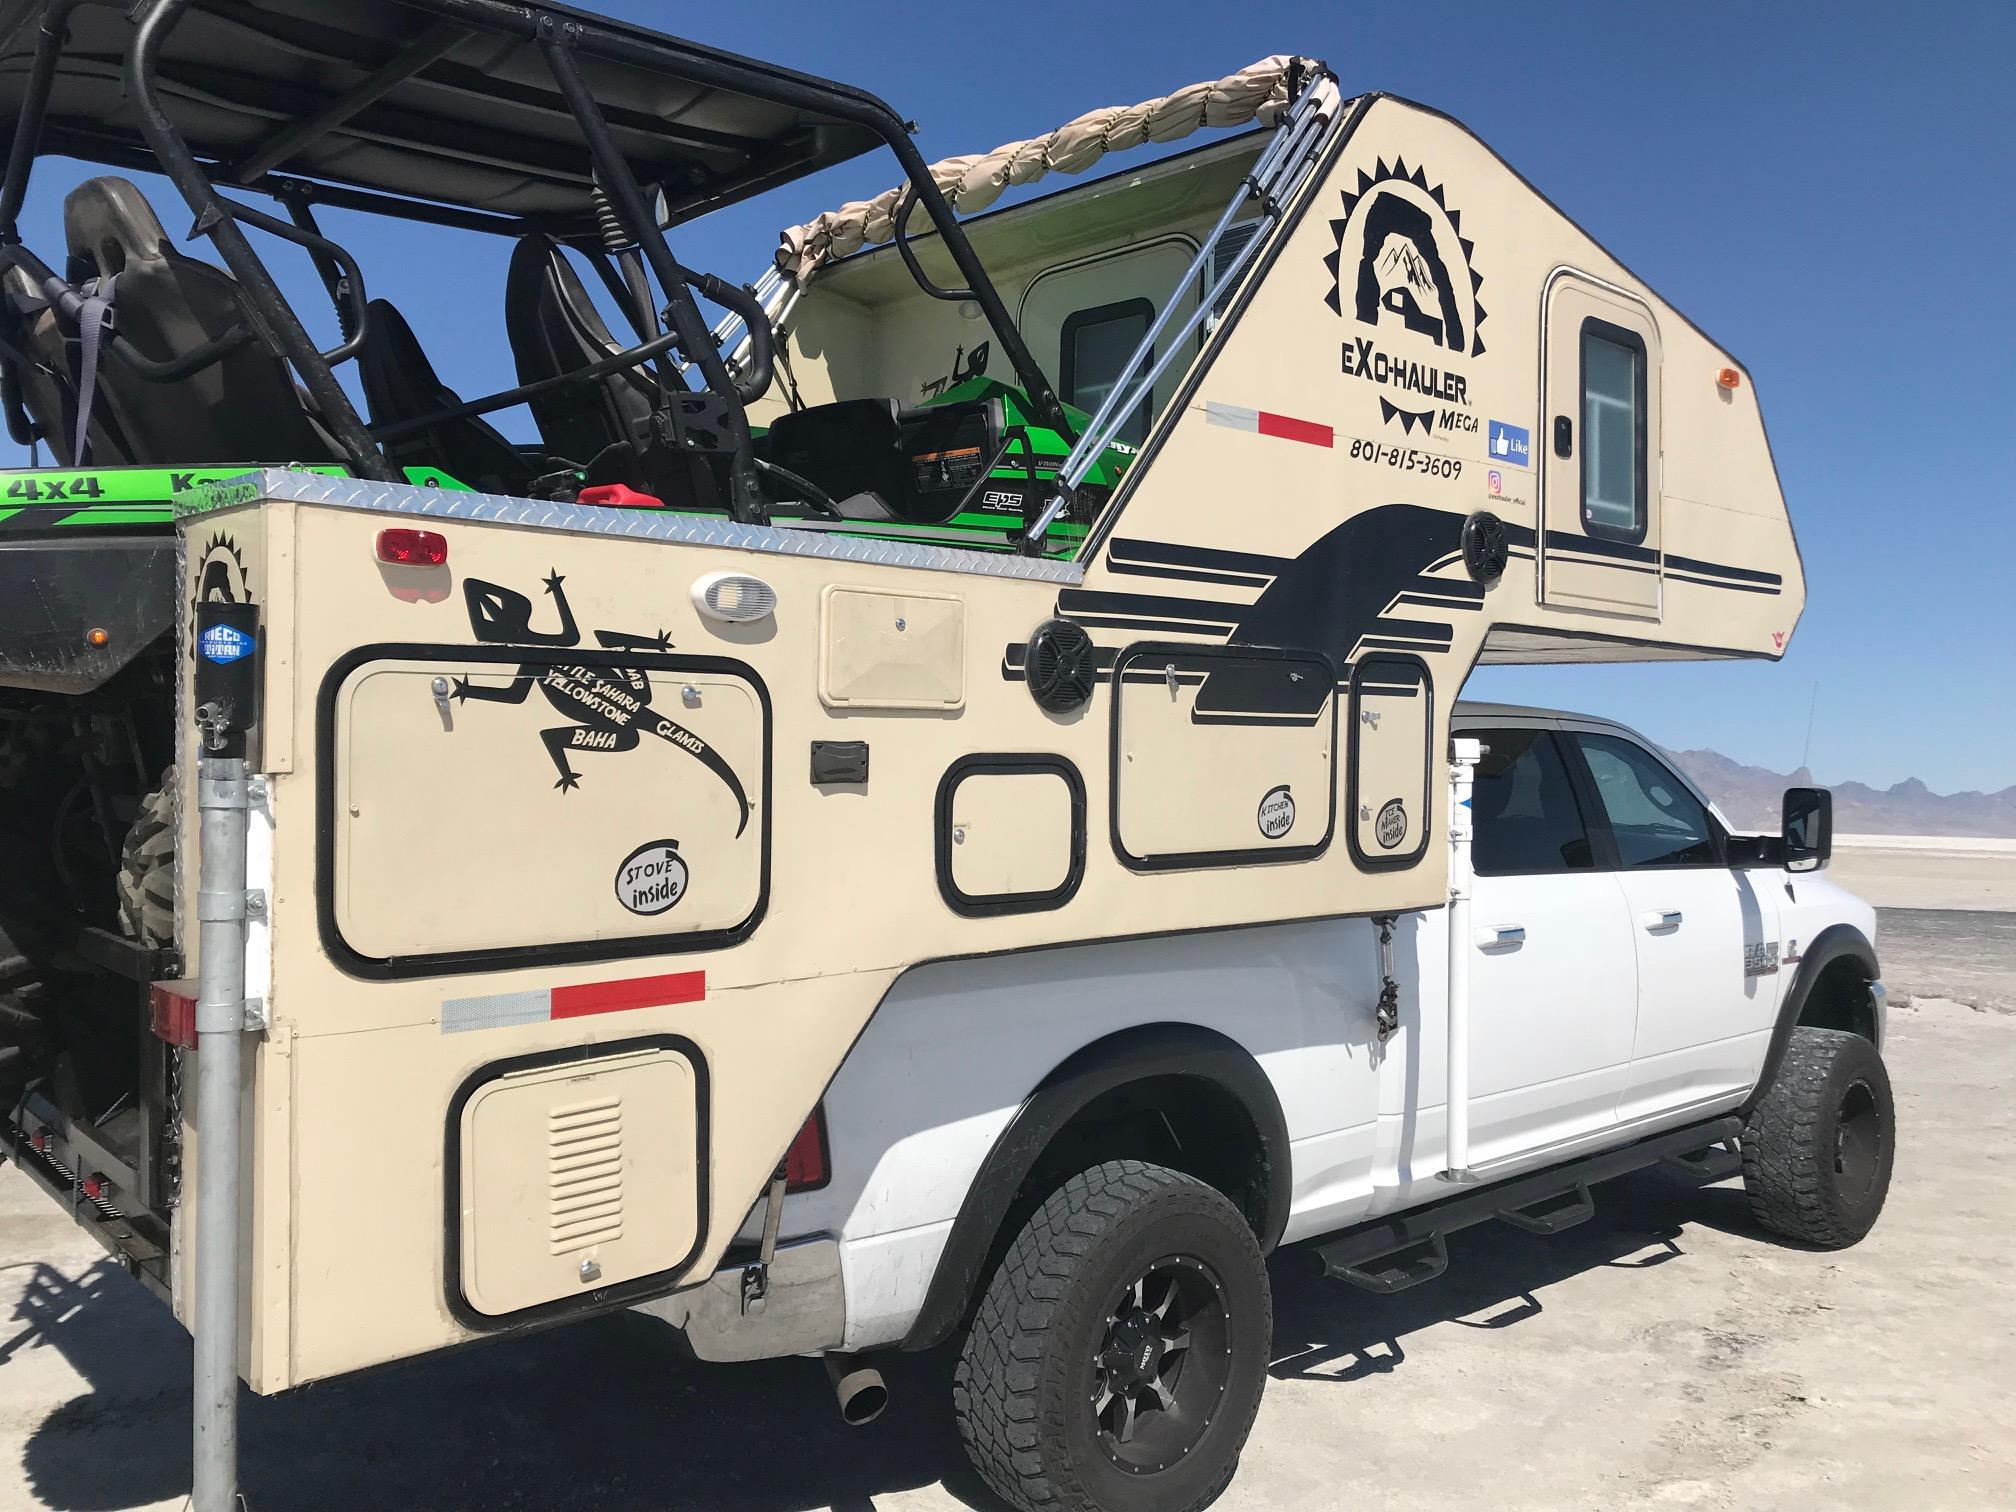 ExoHaul Reveals Revolutionary Toy Hauler Truck Camper